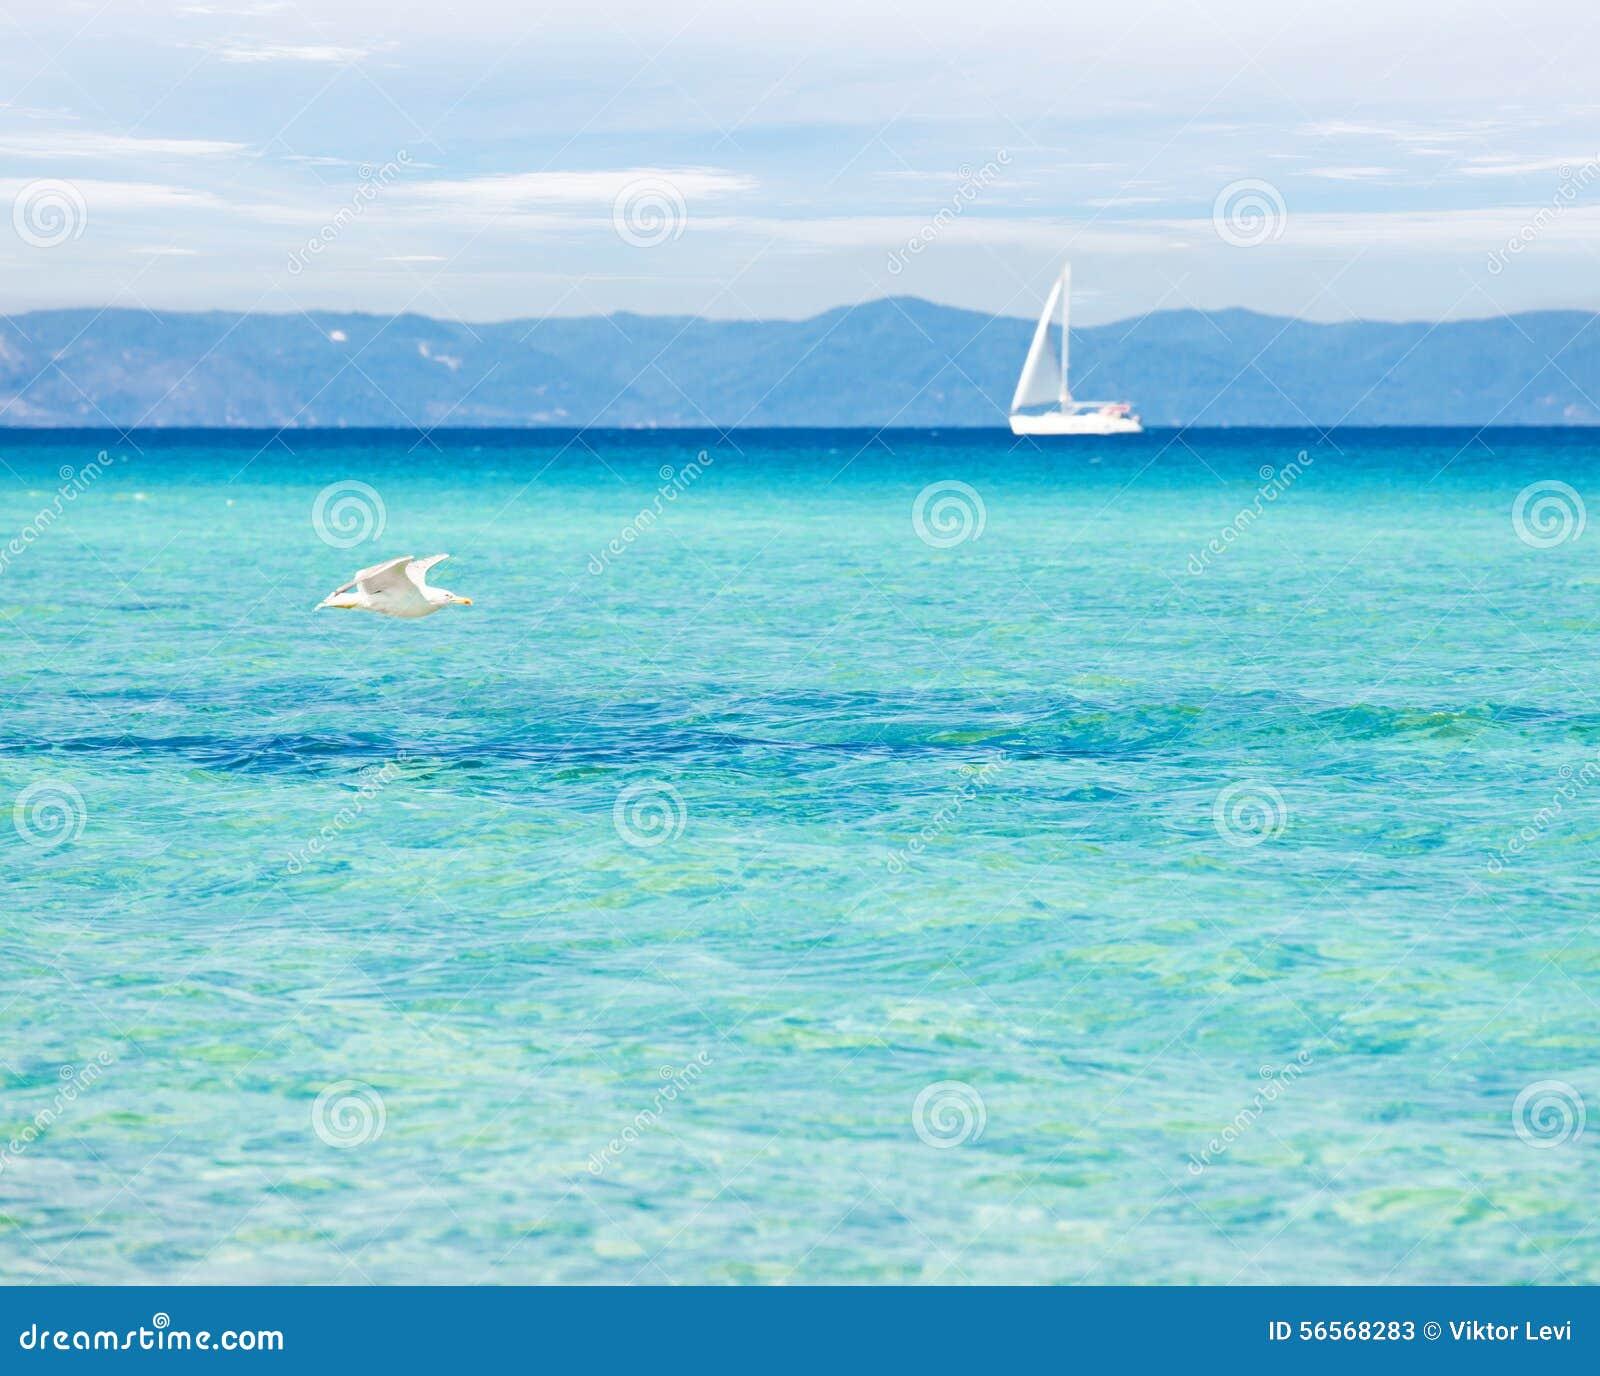 Download Σαφές υπόβαθρο νερού θάλασσας Seagul Στοκ Εικόνα - εικόνα από πέταγμα, ναυτικό: 56568283